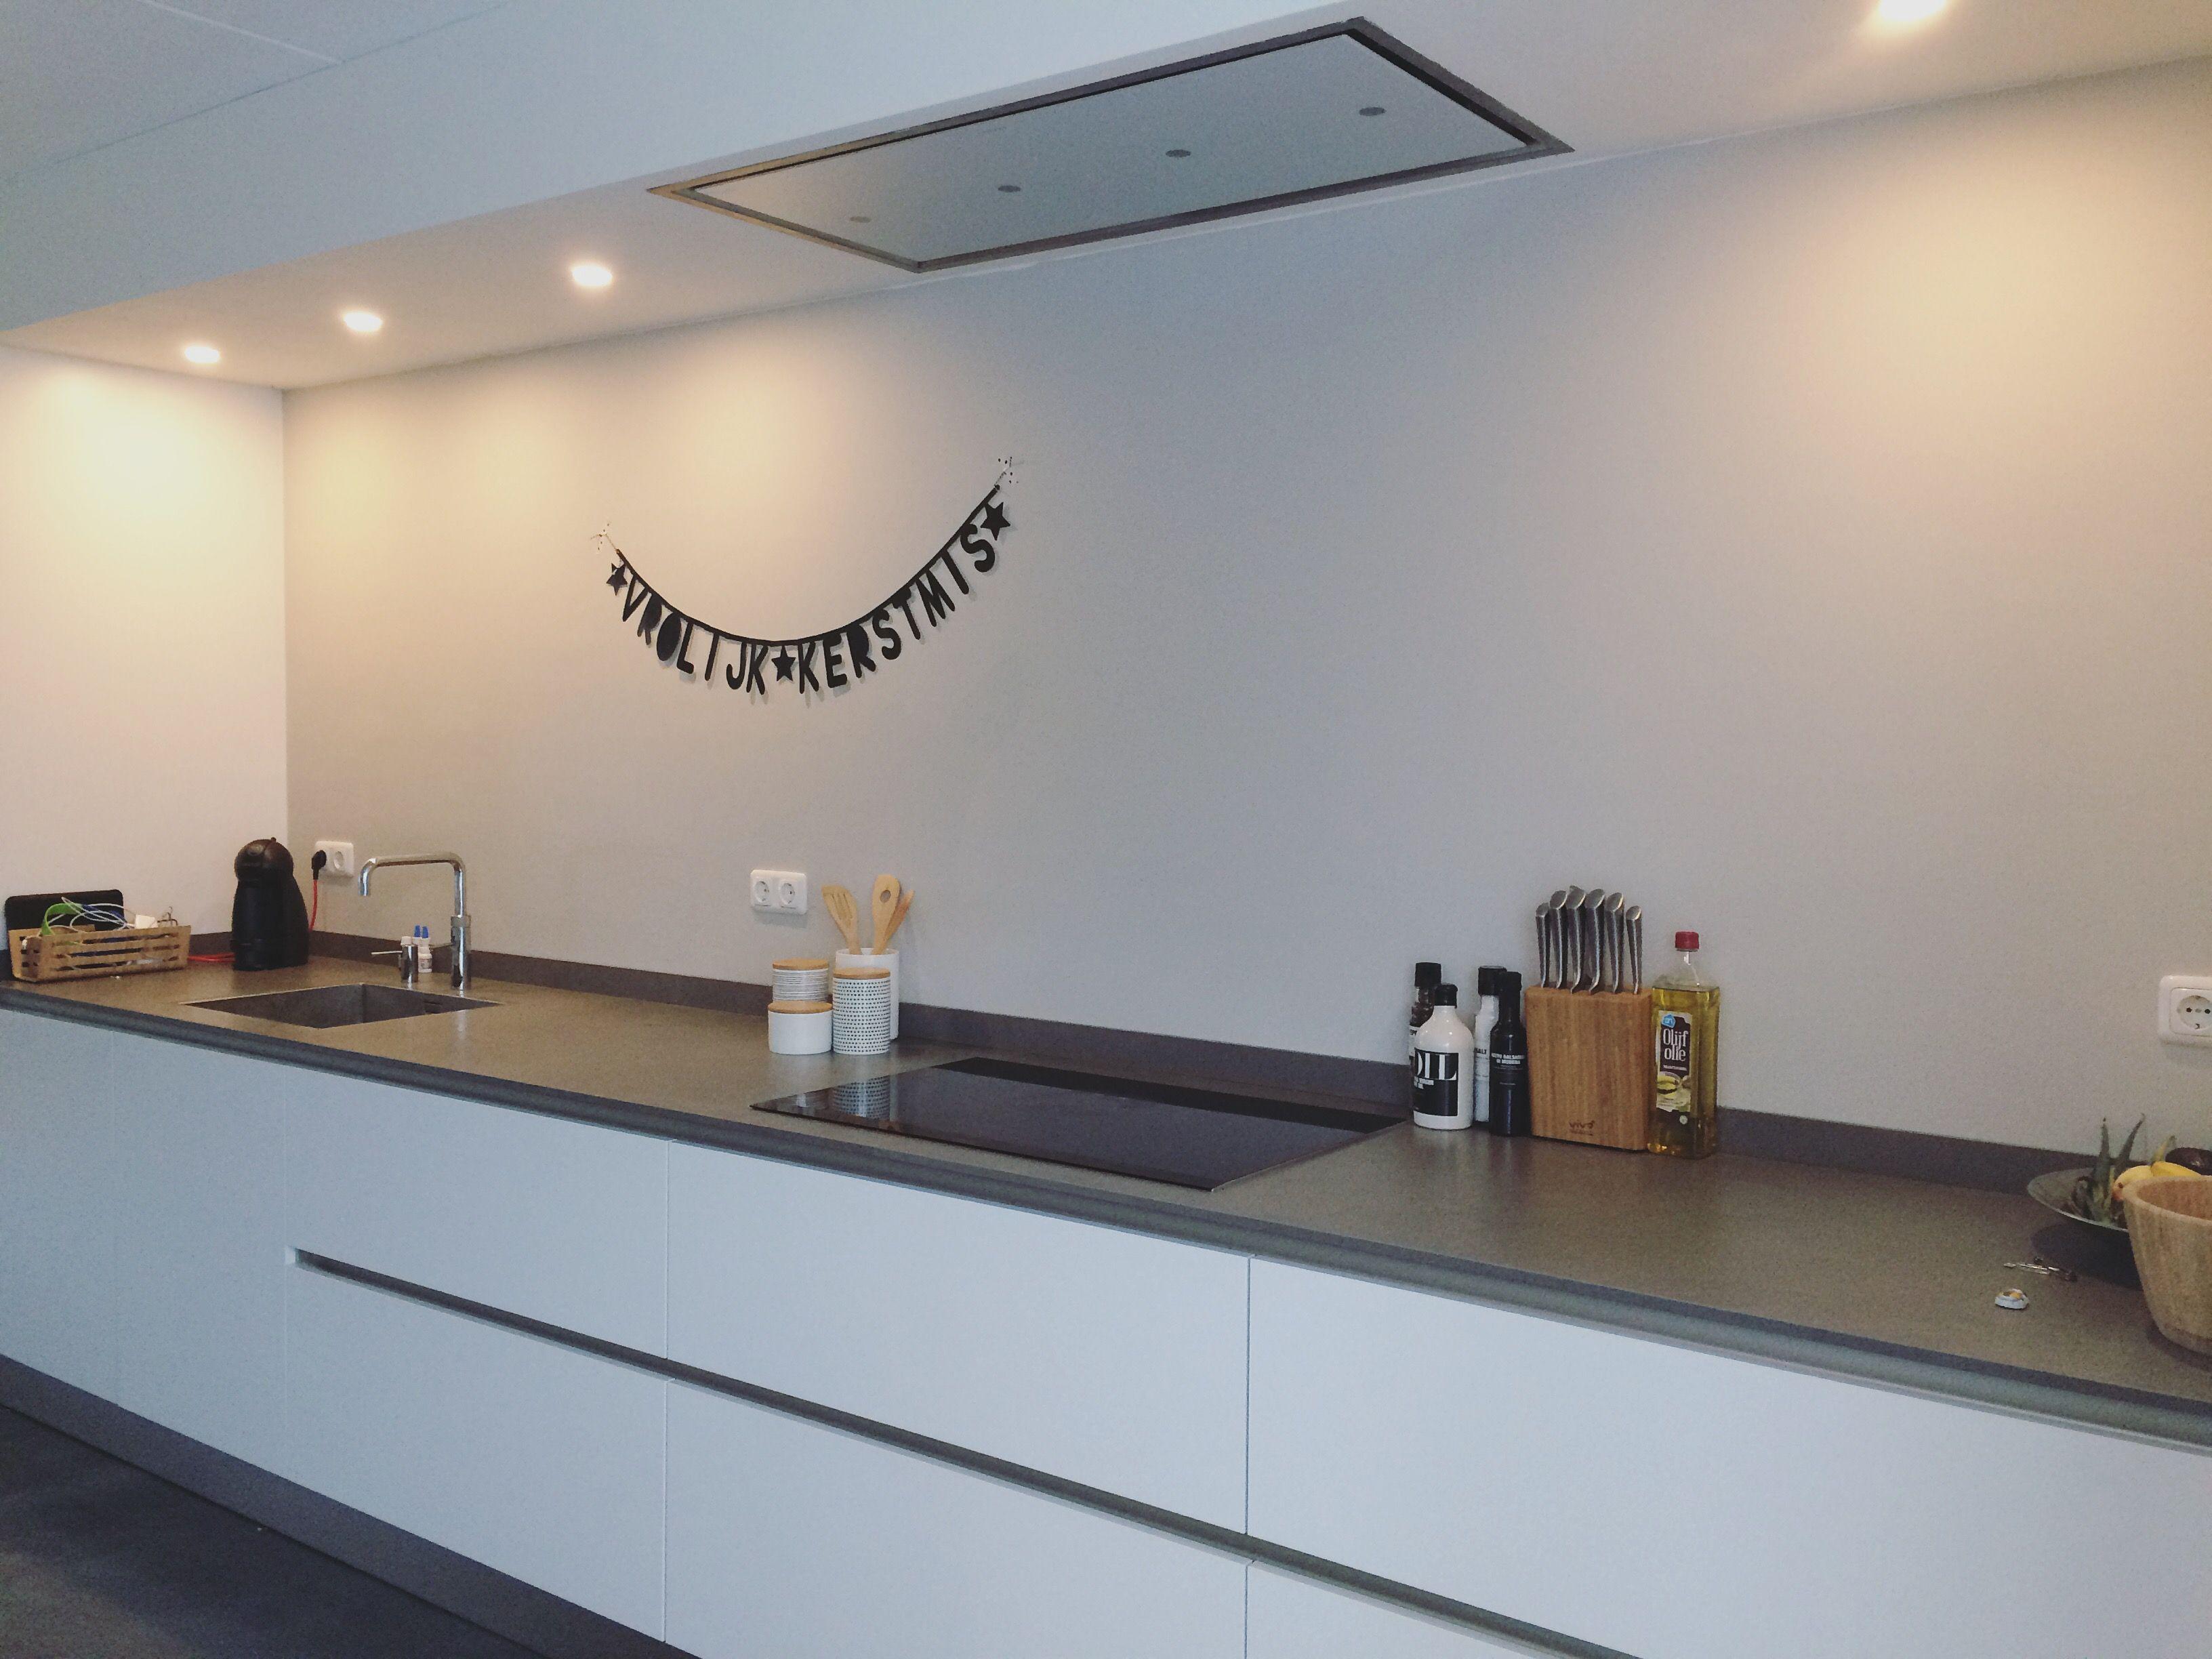 Plafond Afzuigkap Keuken : Keuken strakke keuken witte keuken afzuigkap in plafond kuchenland